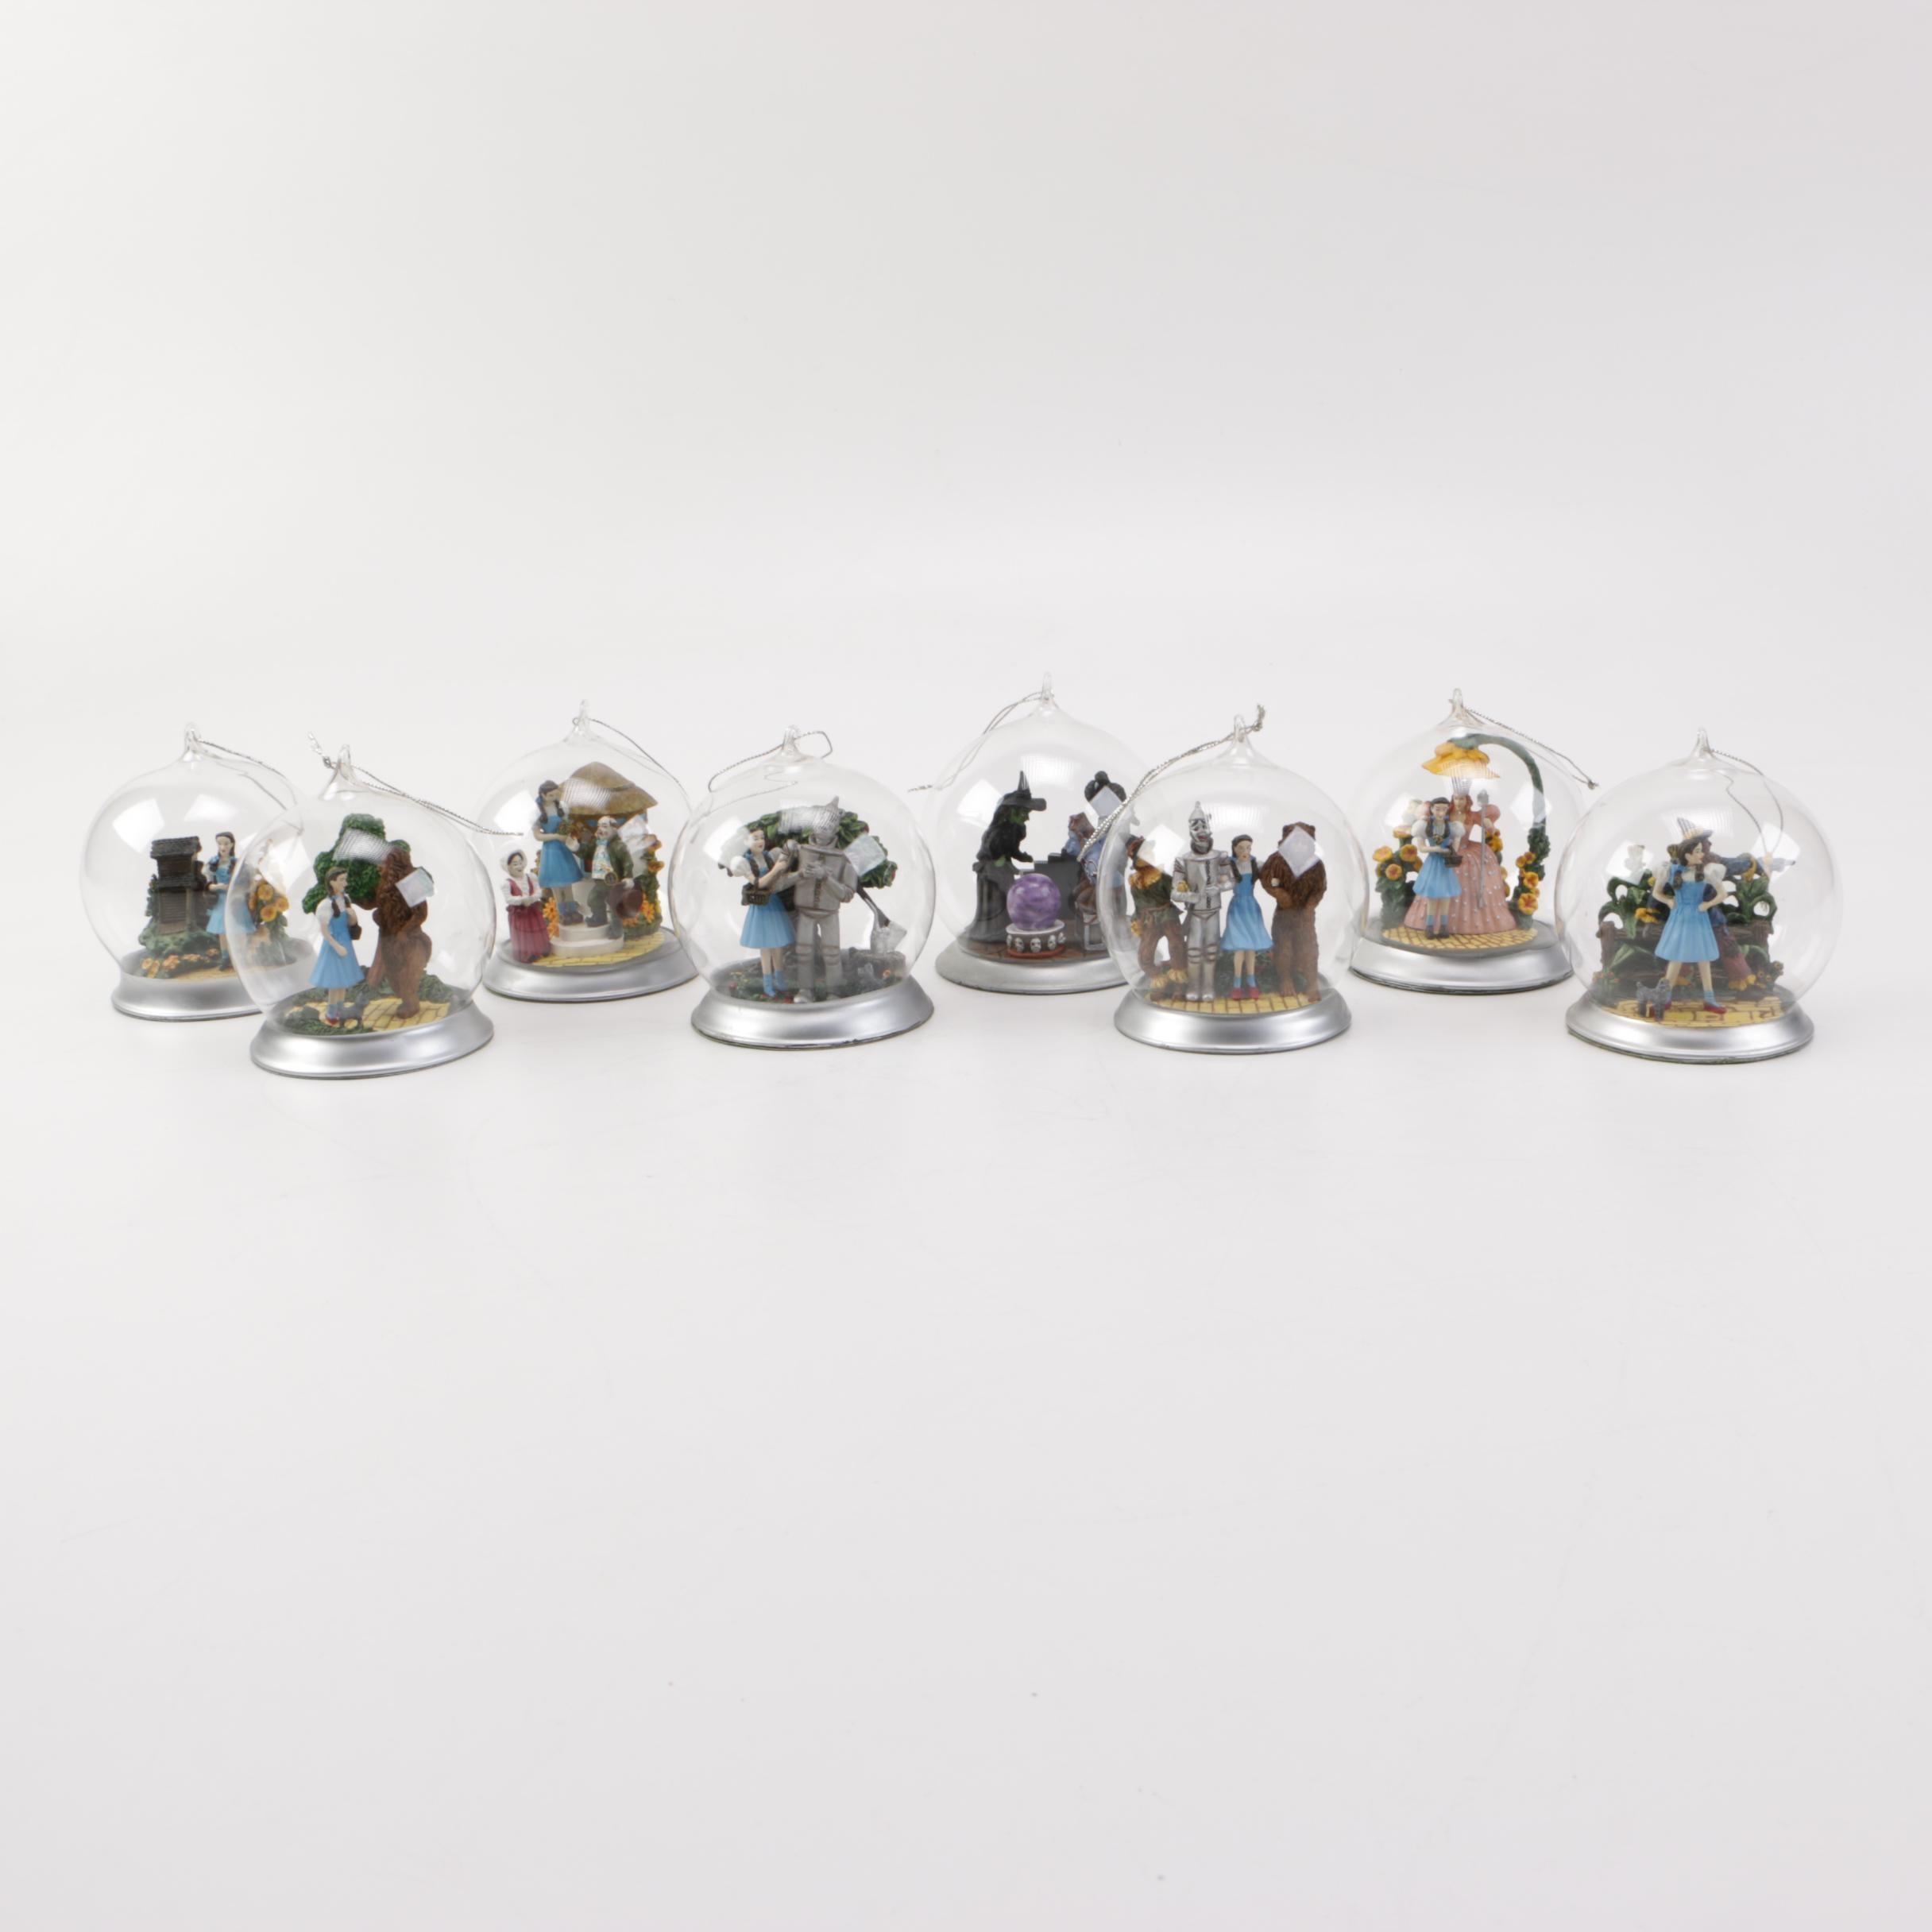 Bradford Editions Wizard of Oz Globe Ornaments